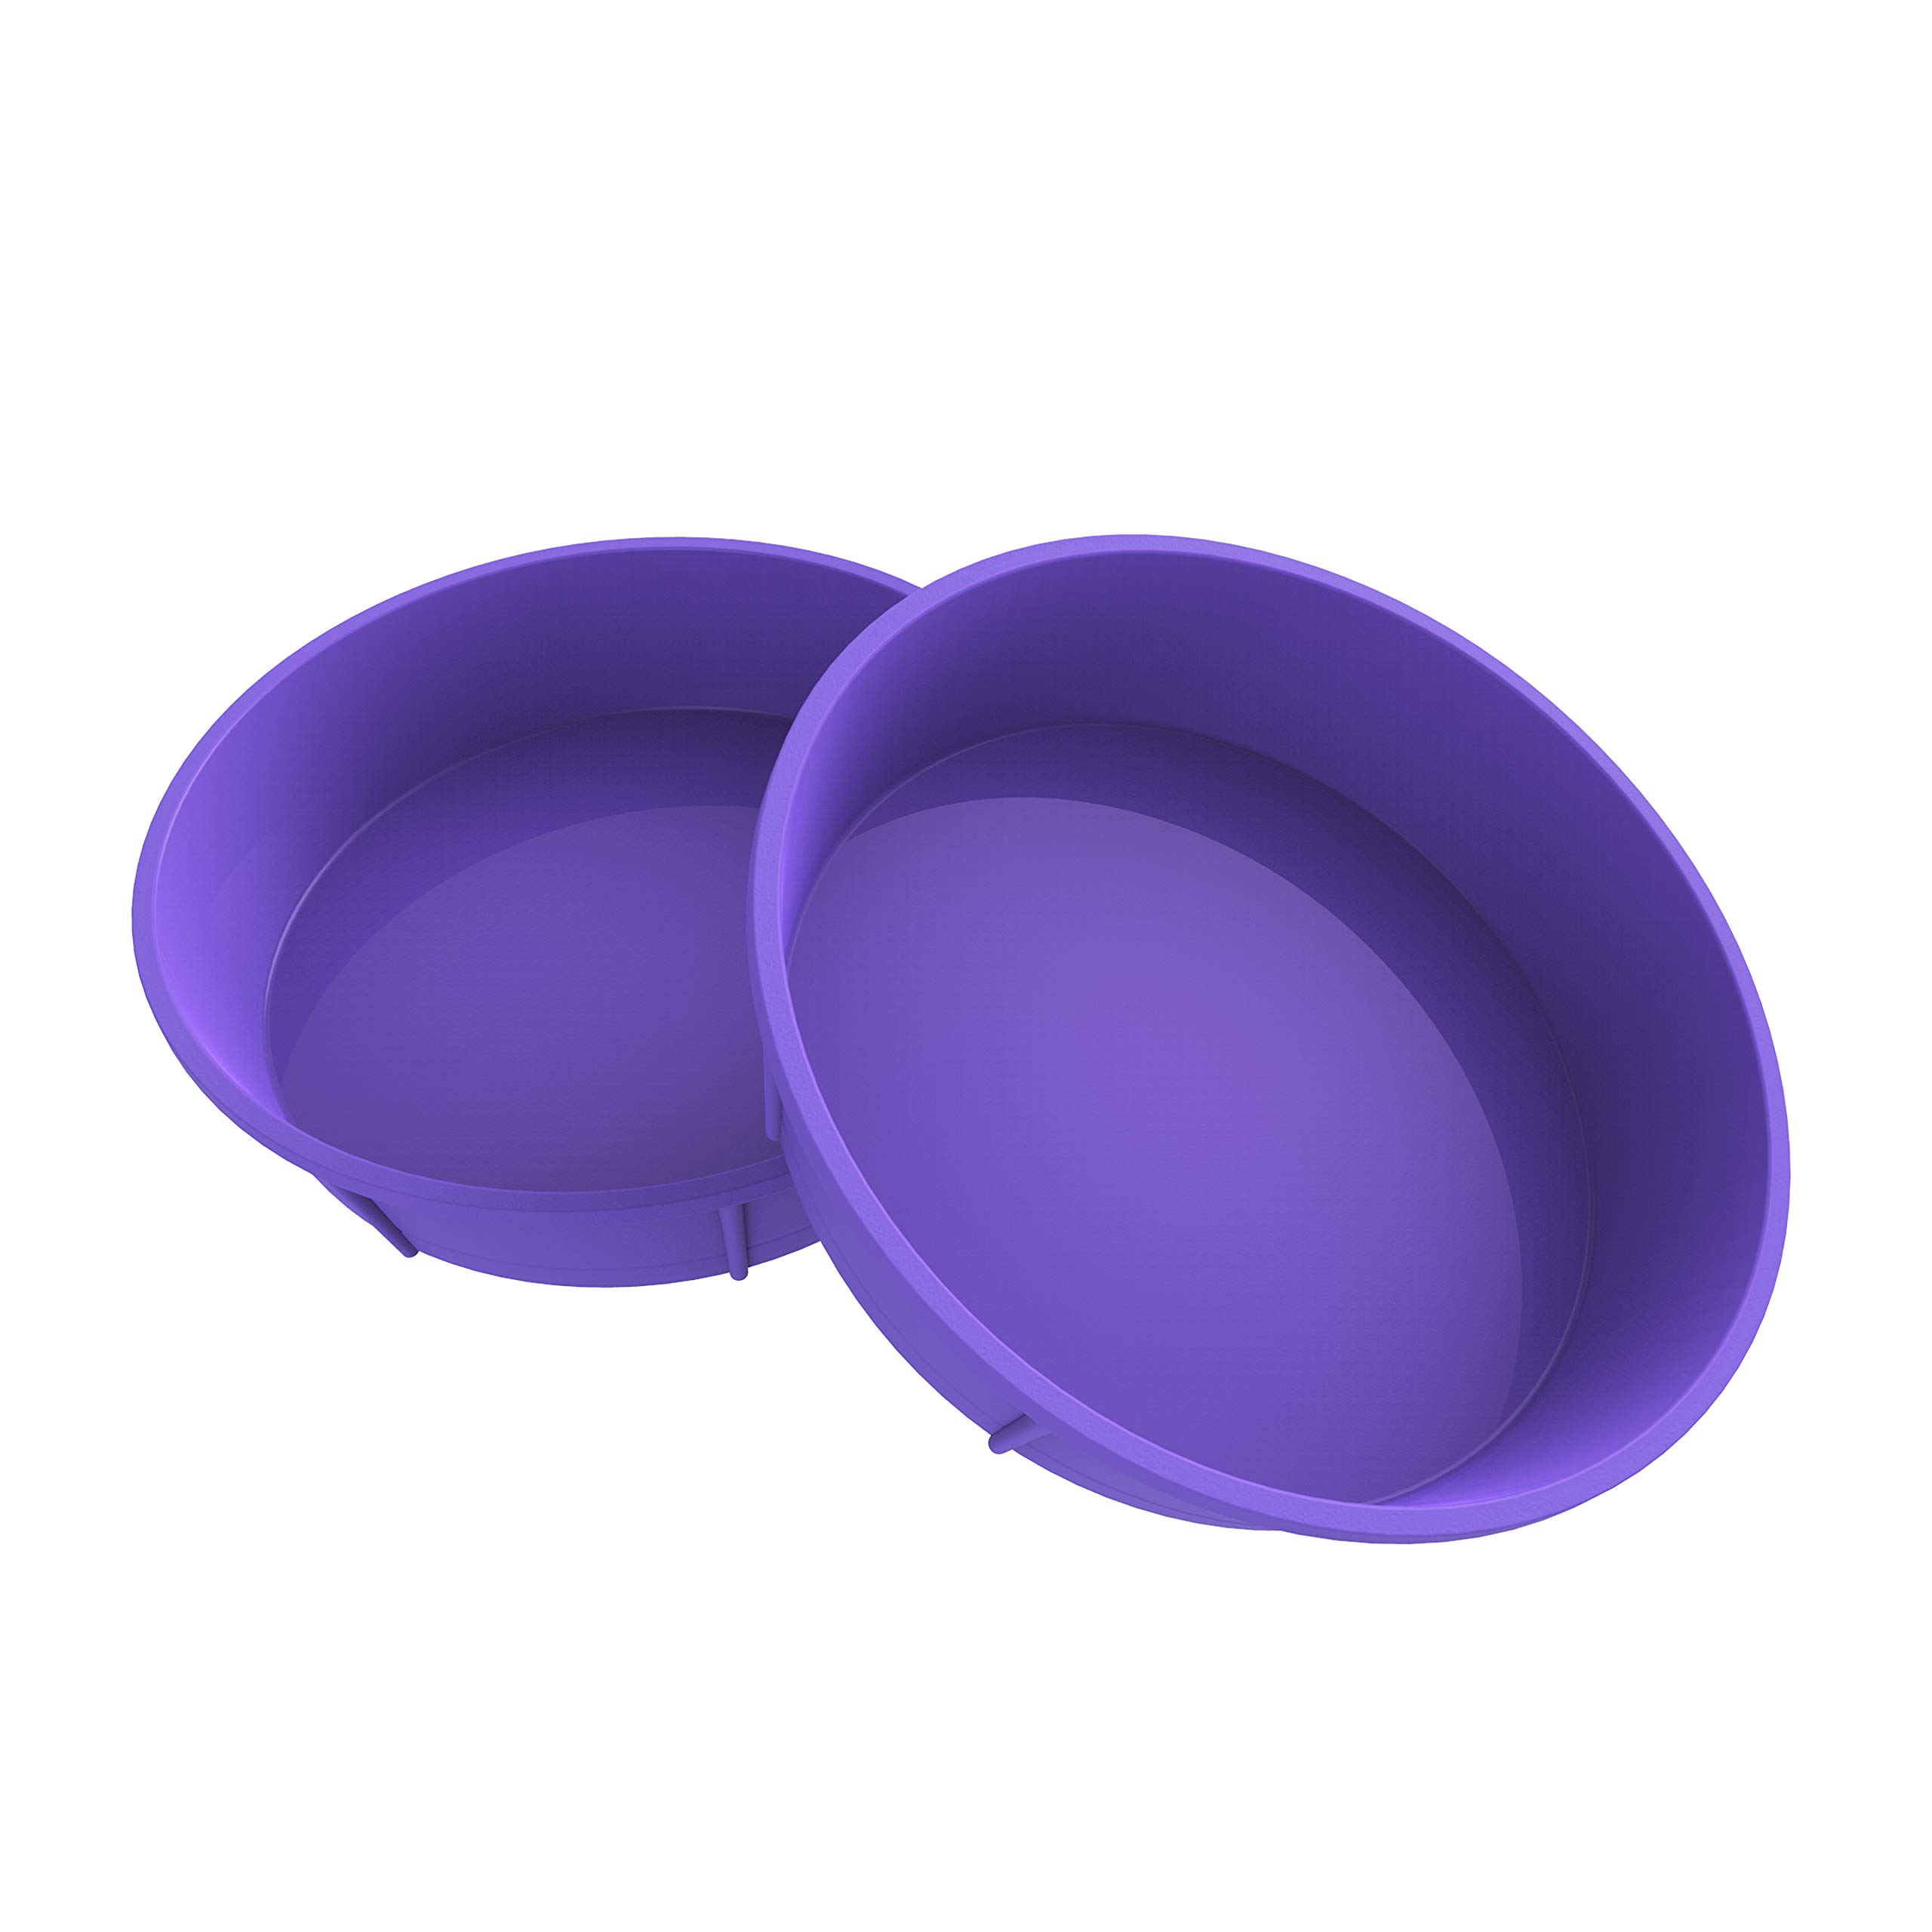 Bakerpan Premium Medium Silicone Round Cake Pan, Round Mold, 7.75 inches (Purple, 2)